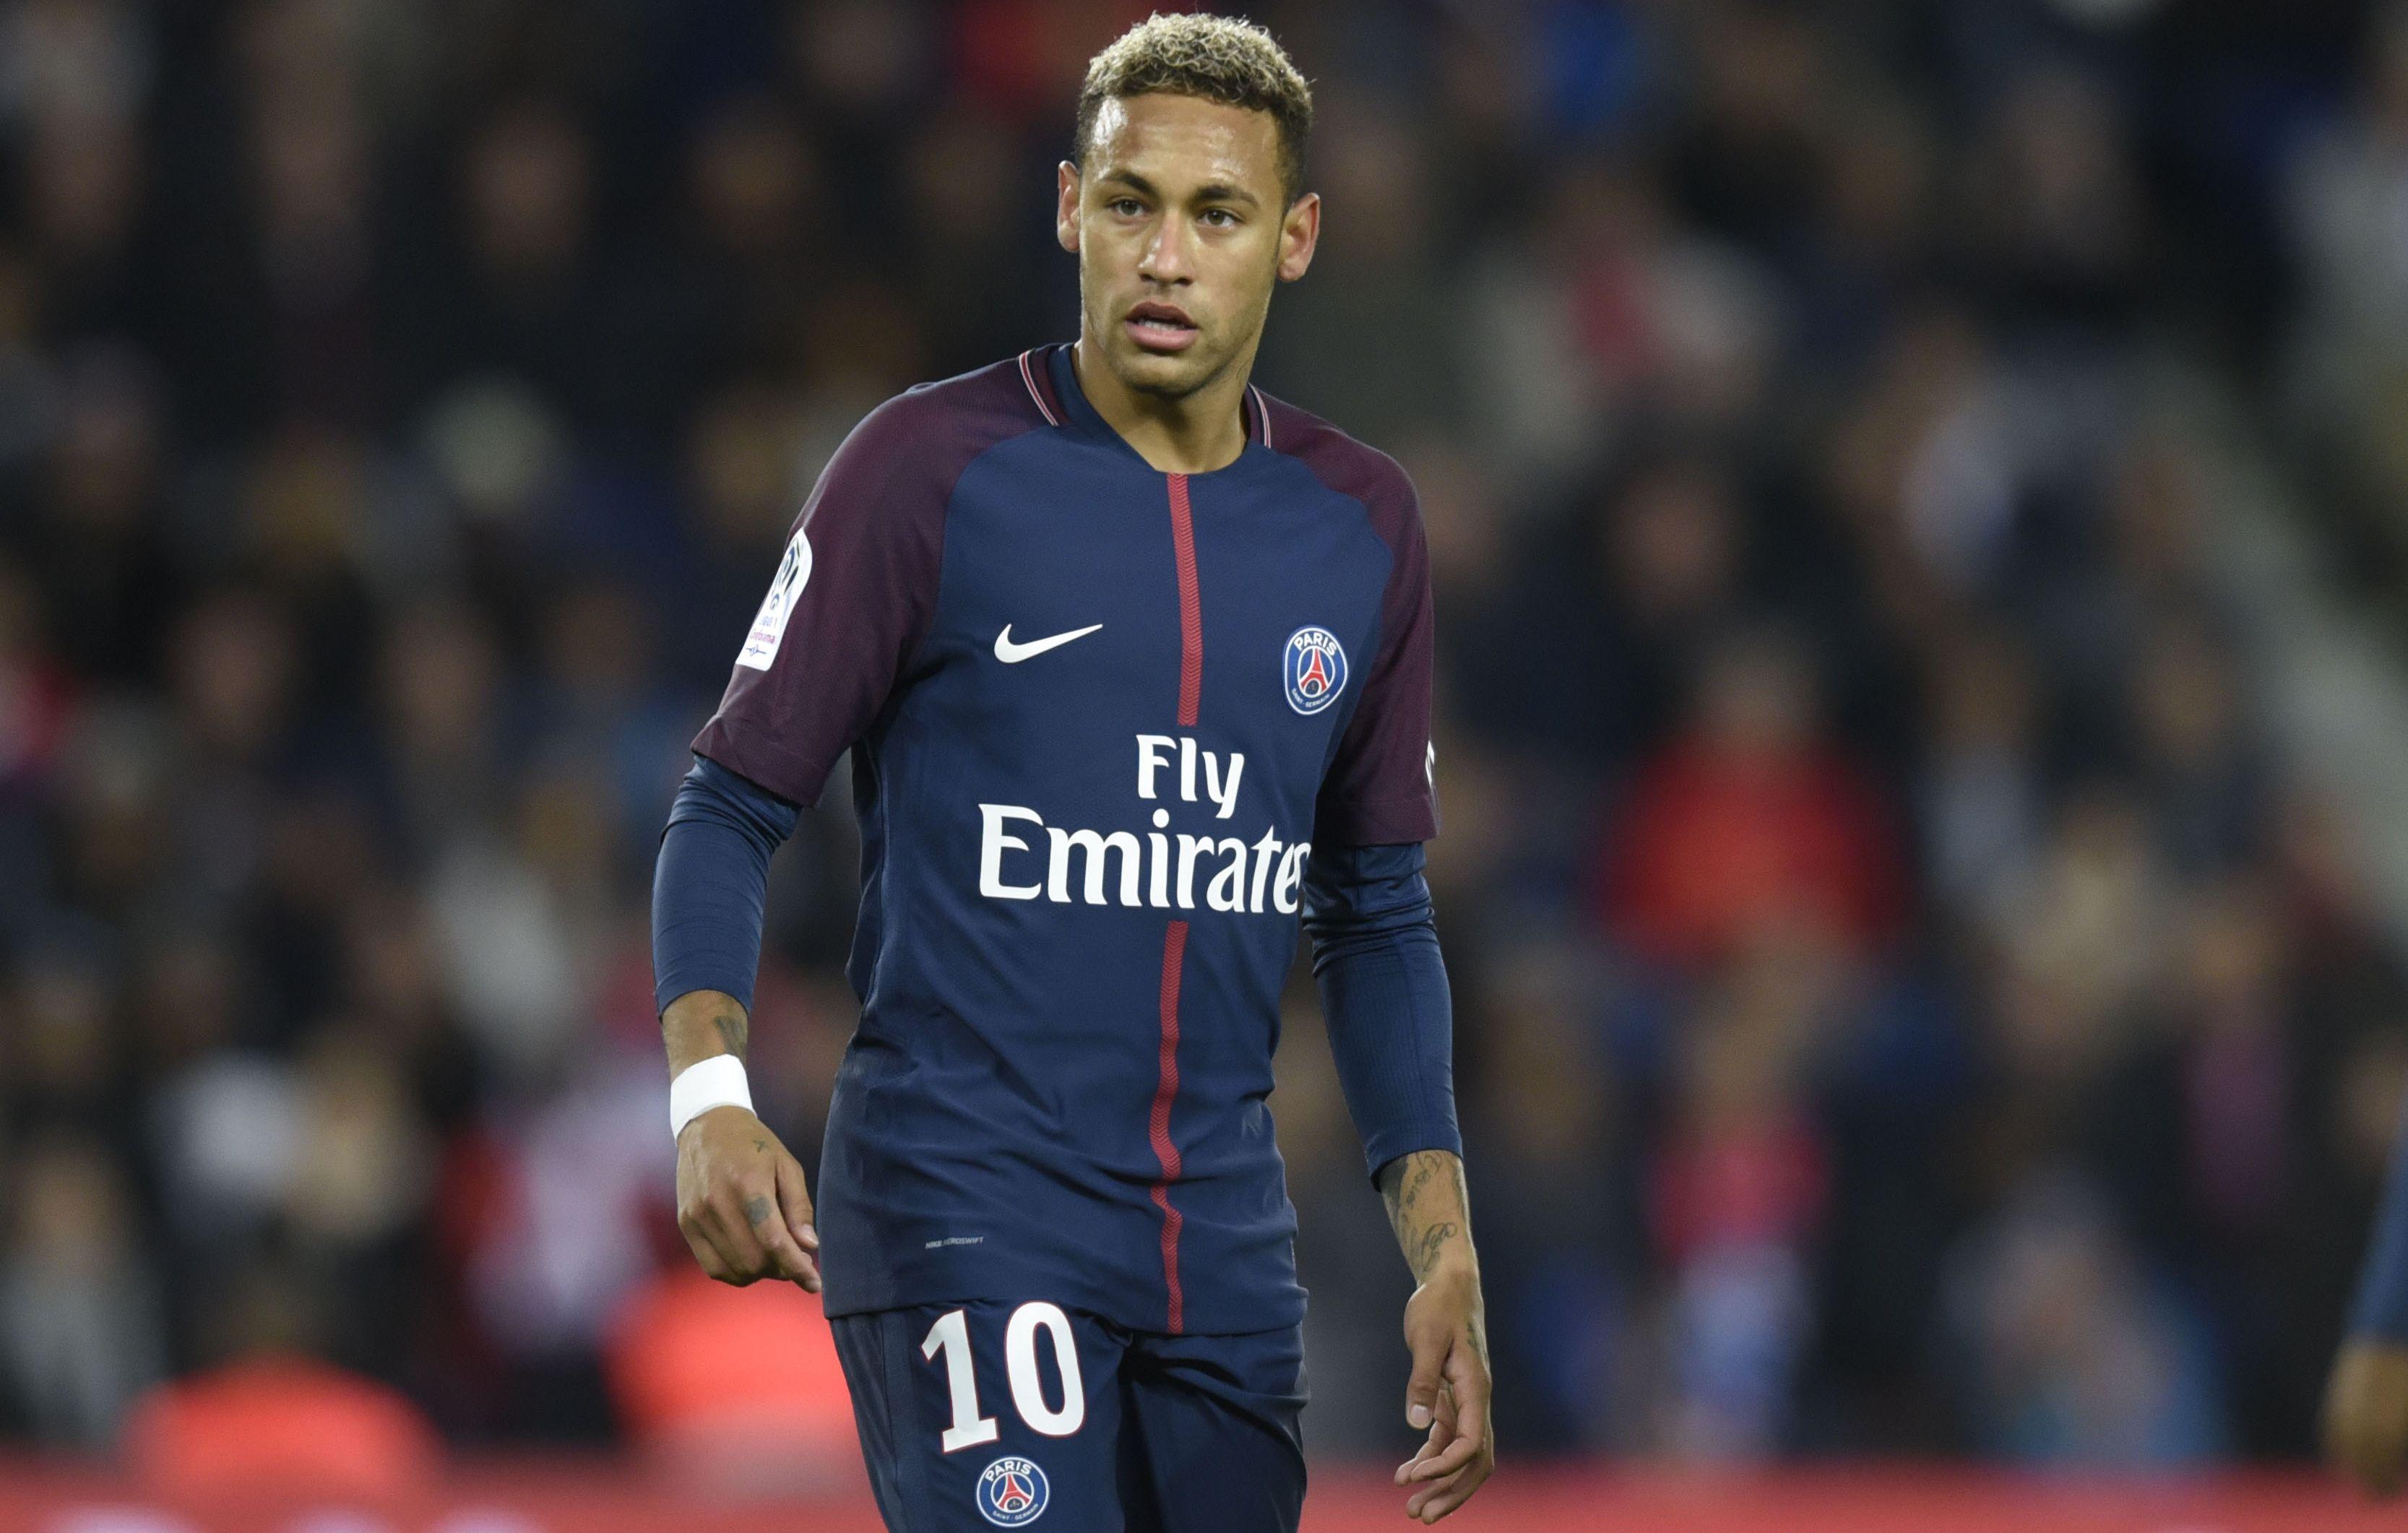 Football - Ligue 1 - PSG : Neymar forfait à Montpellier